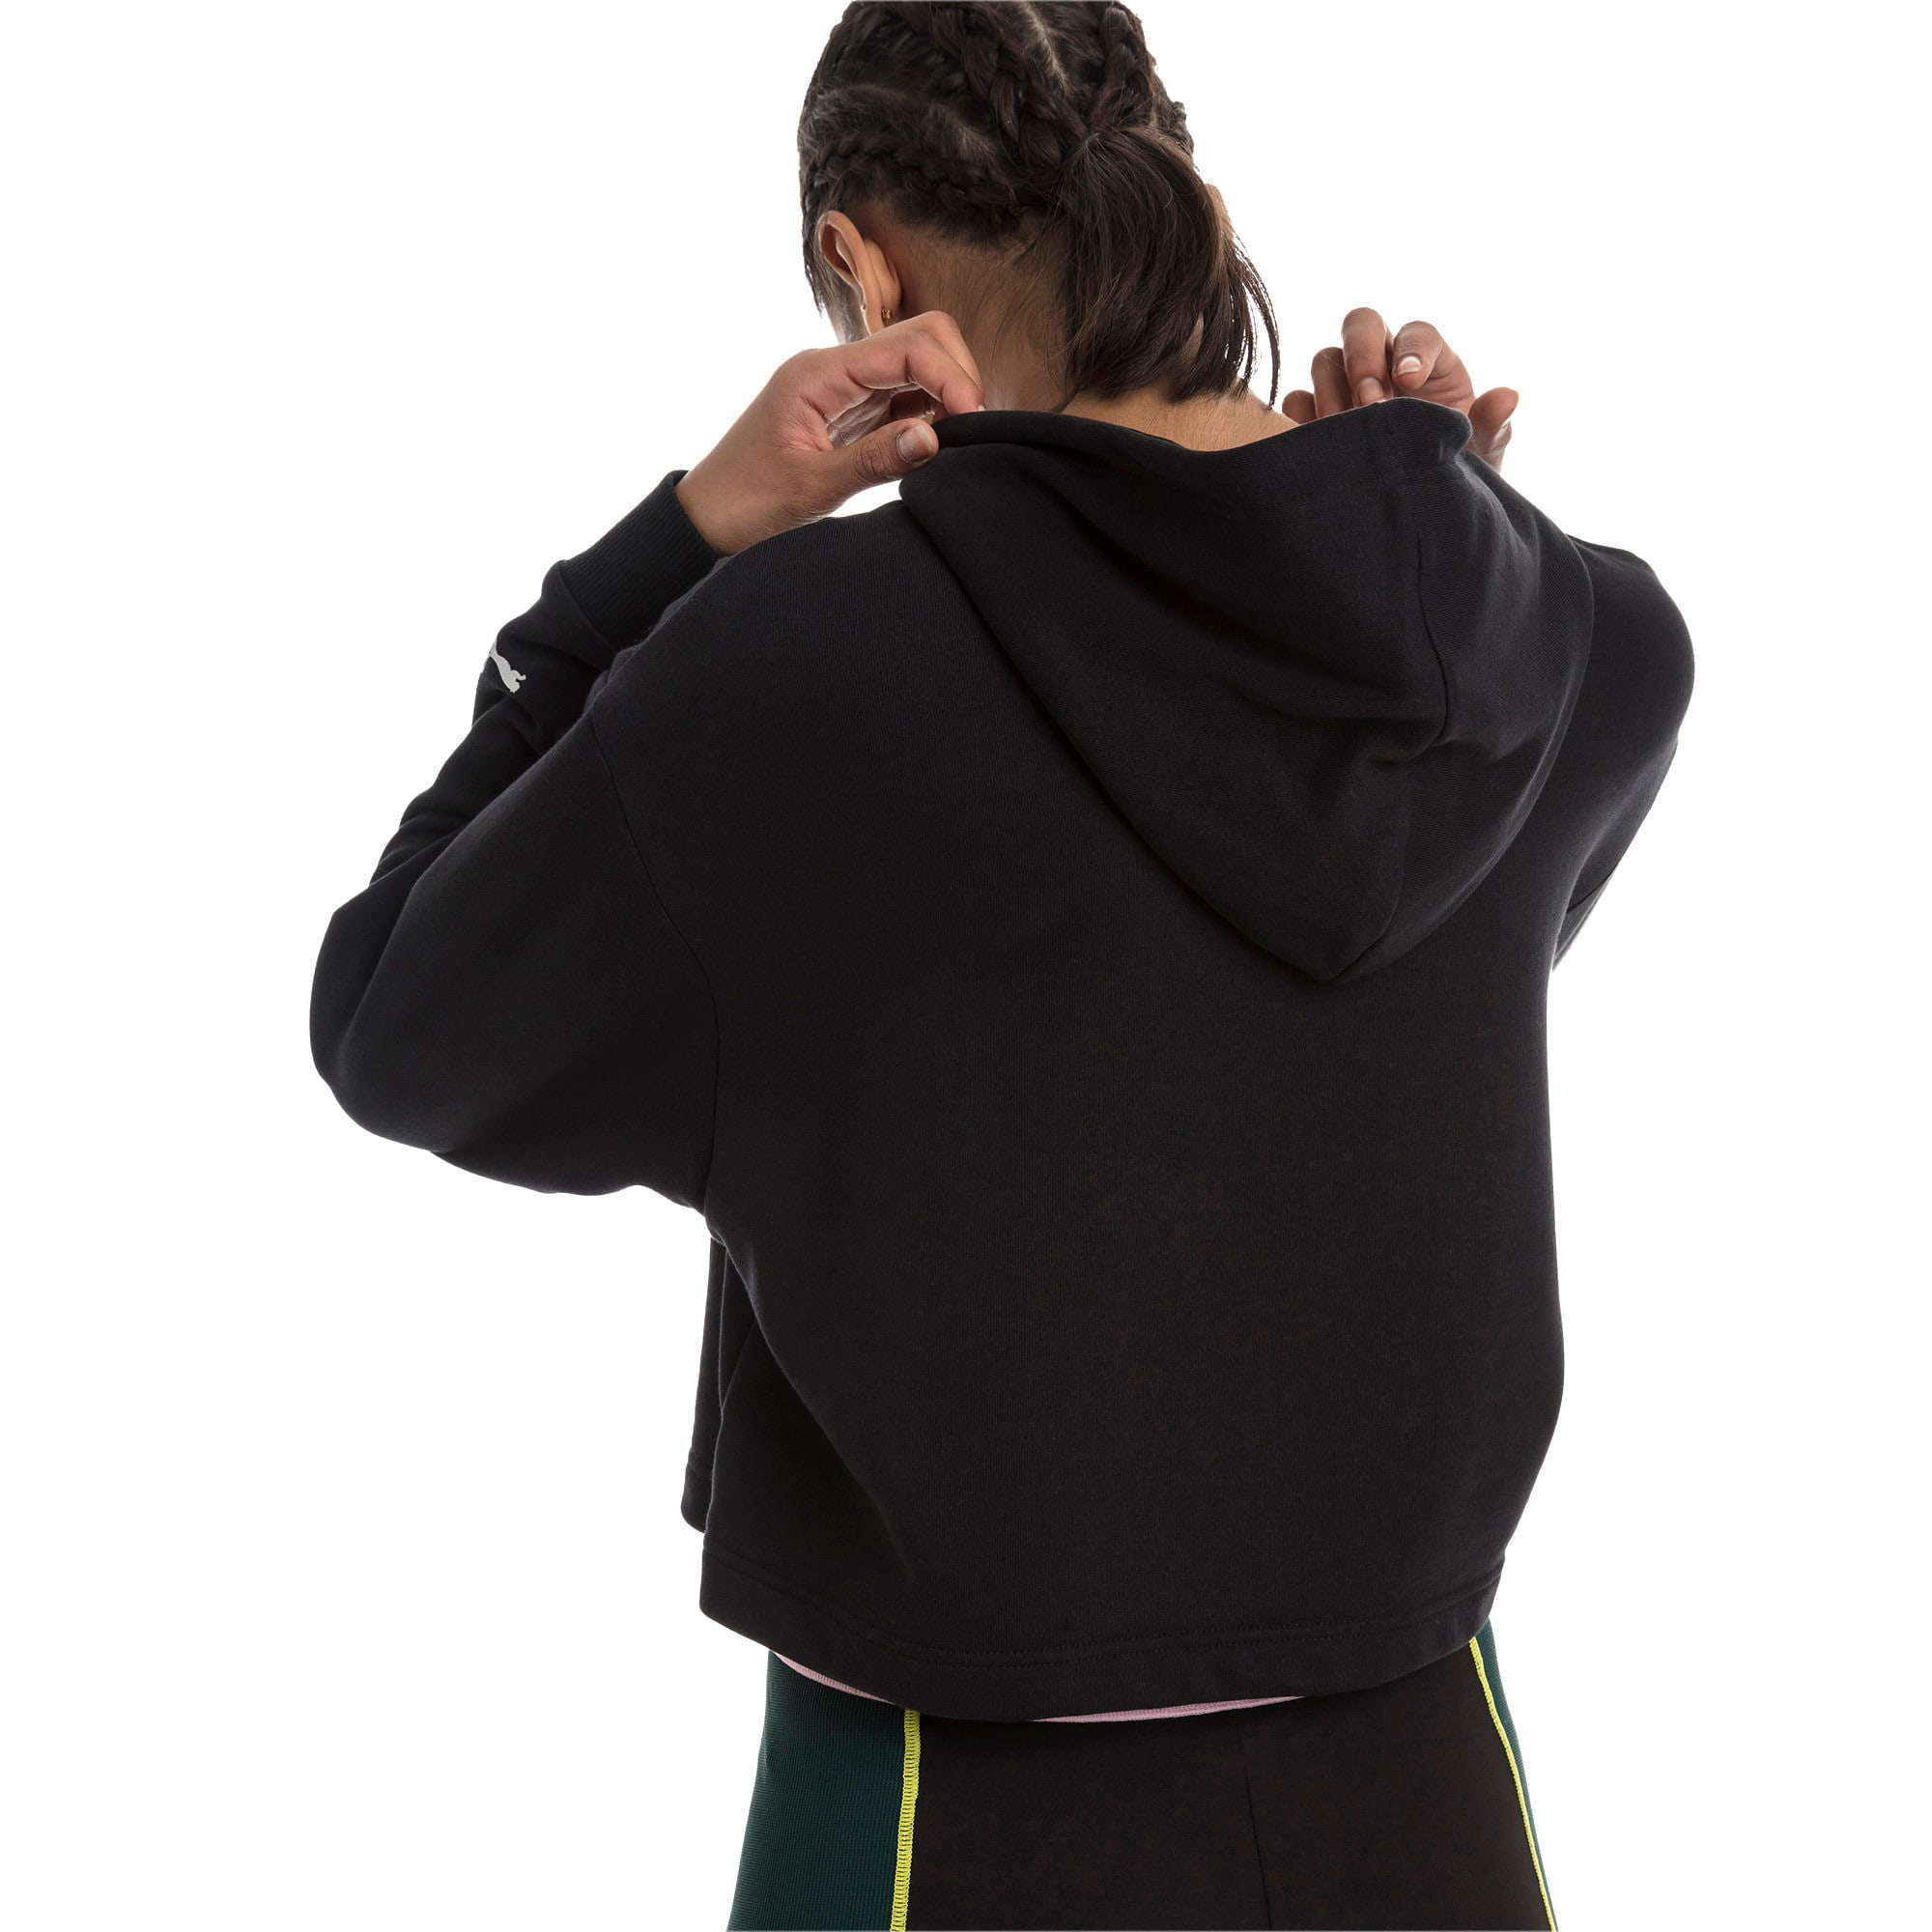 Thumbnail 2 of Trailblazer Women's Hoodie, Cotton Black, medium